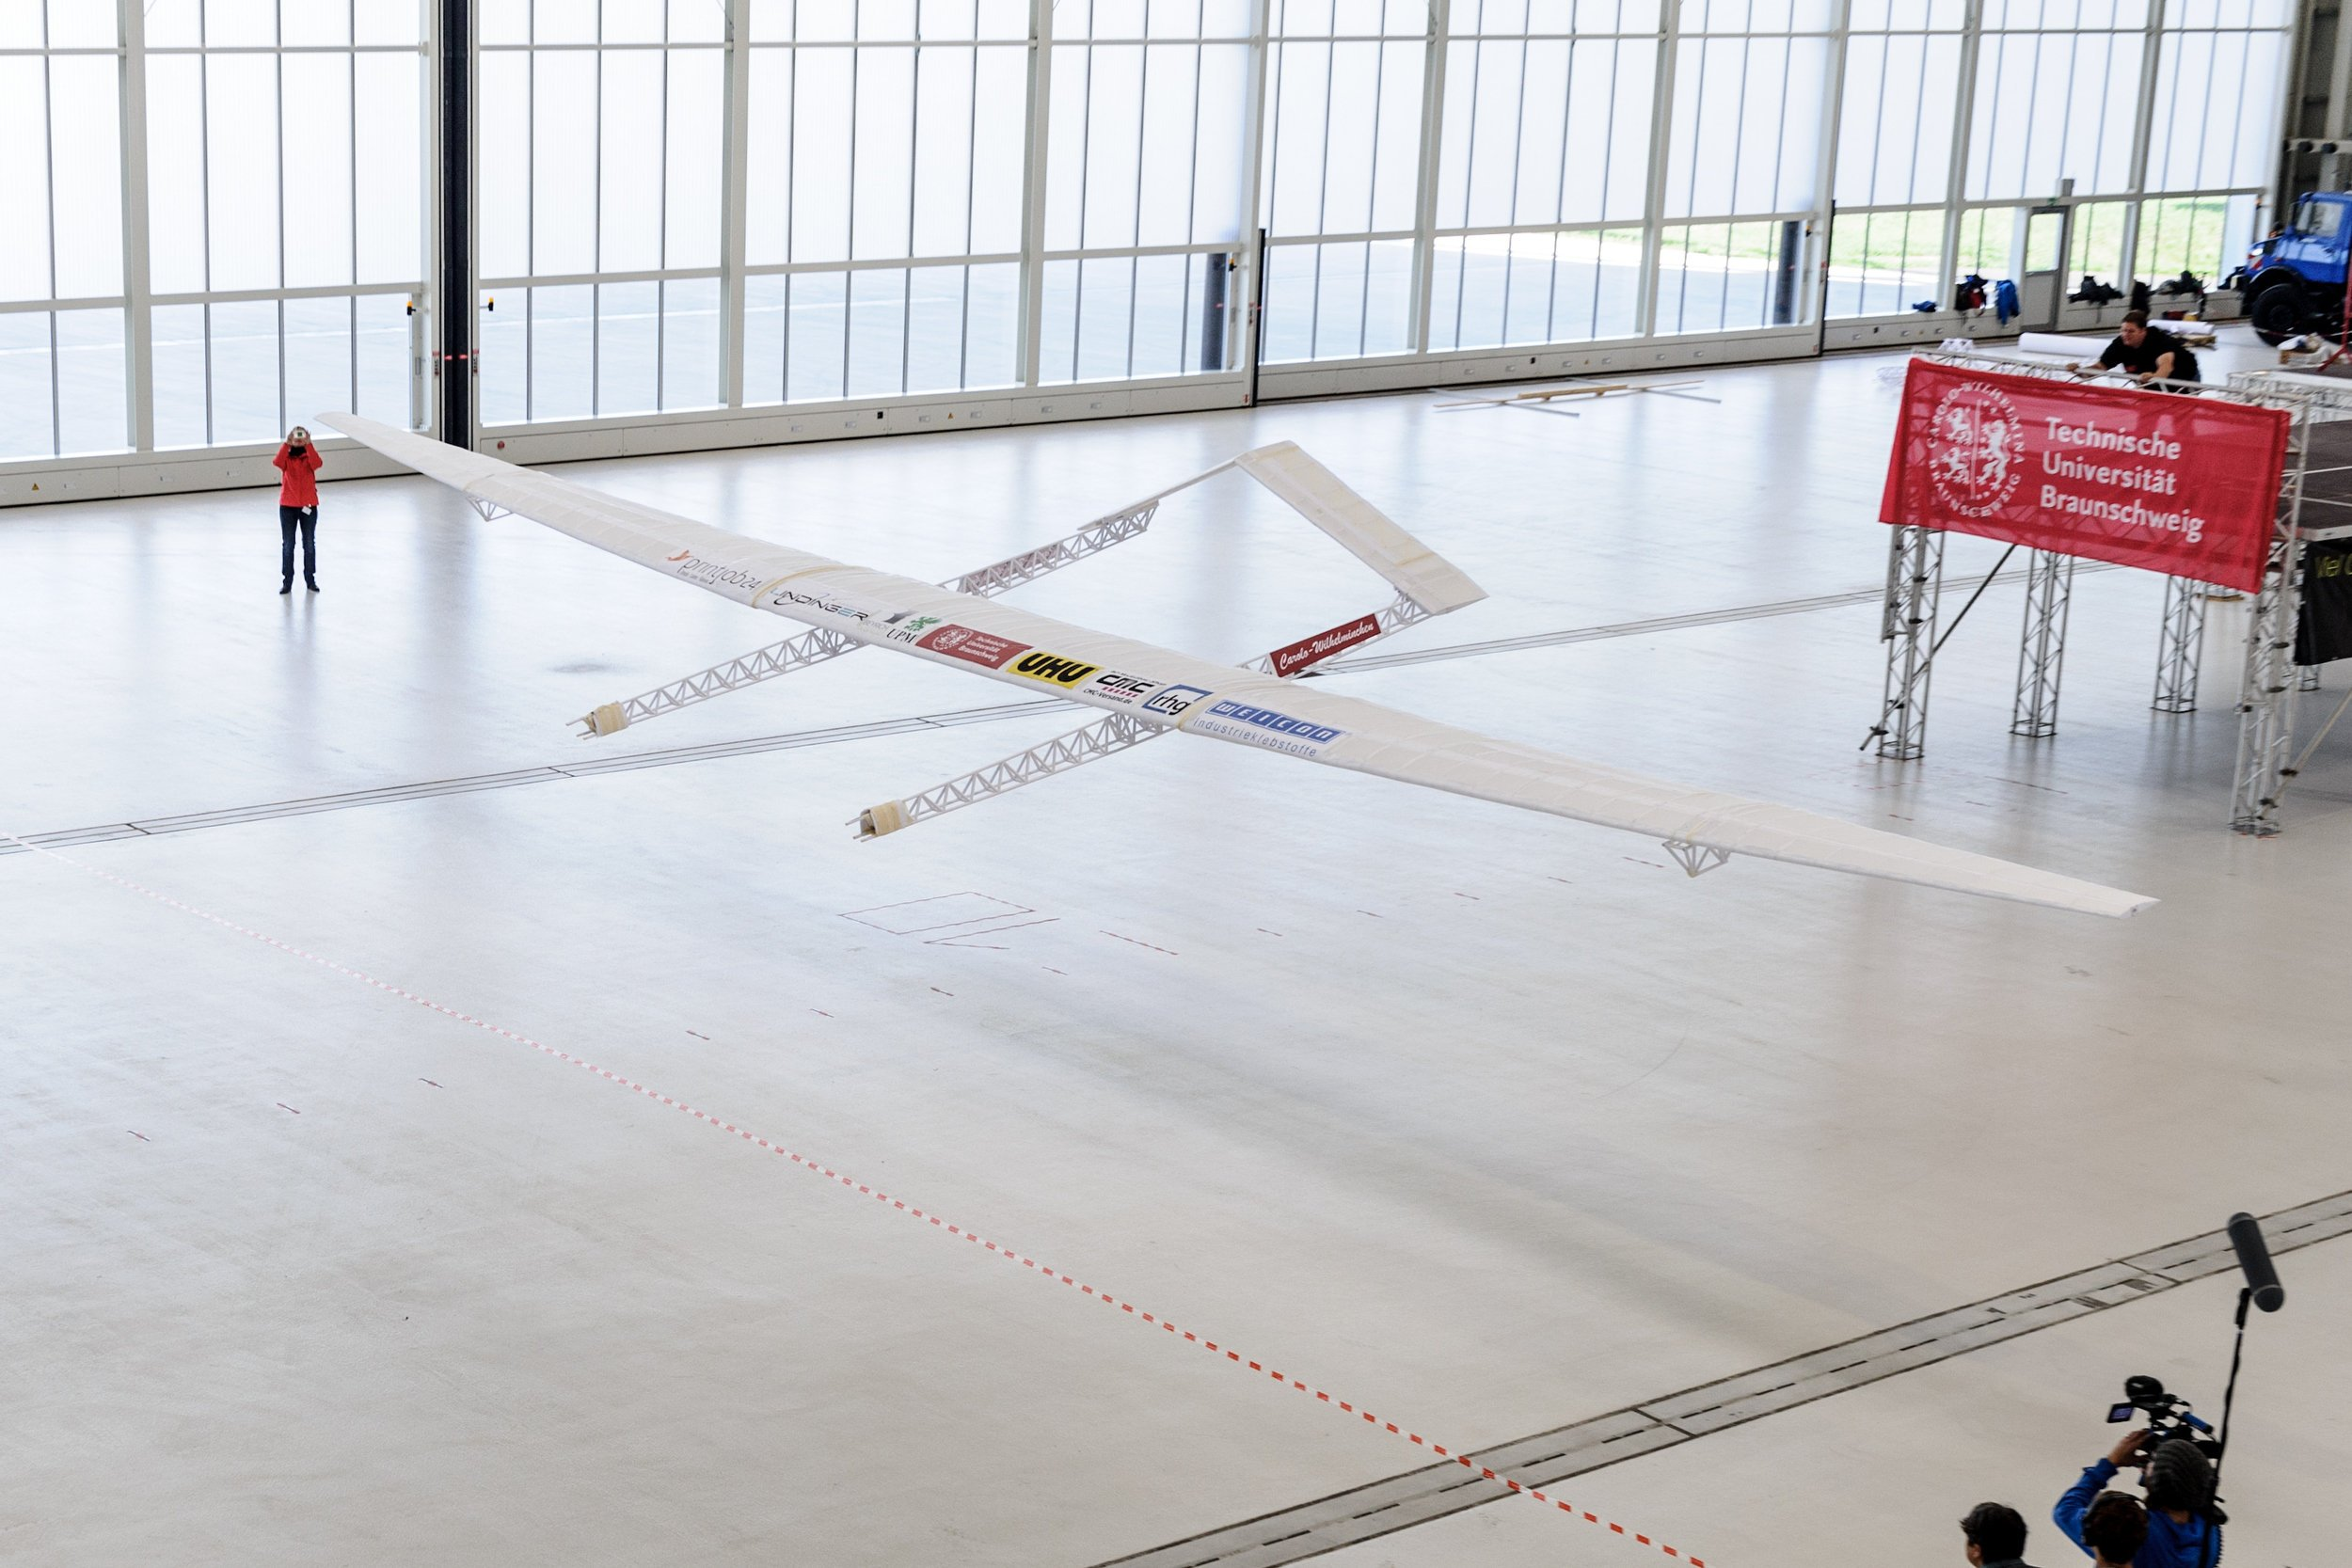 Der weltgrößte Papierflieger bei seinem 18 Meter langen Flug.